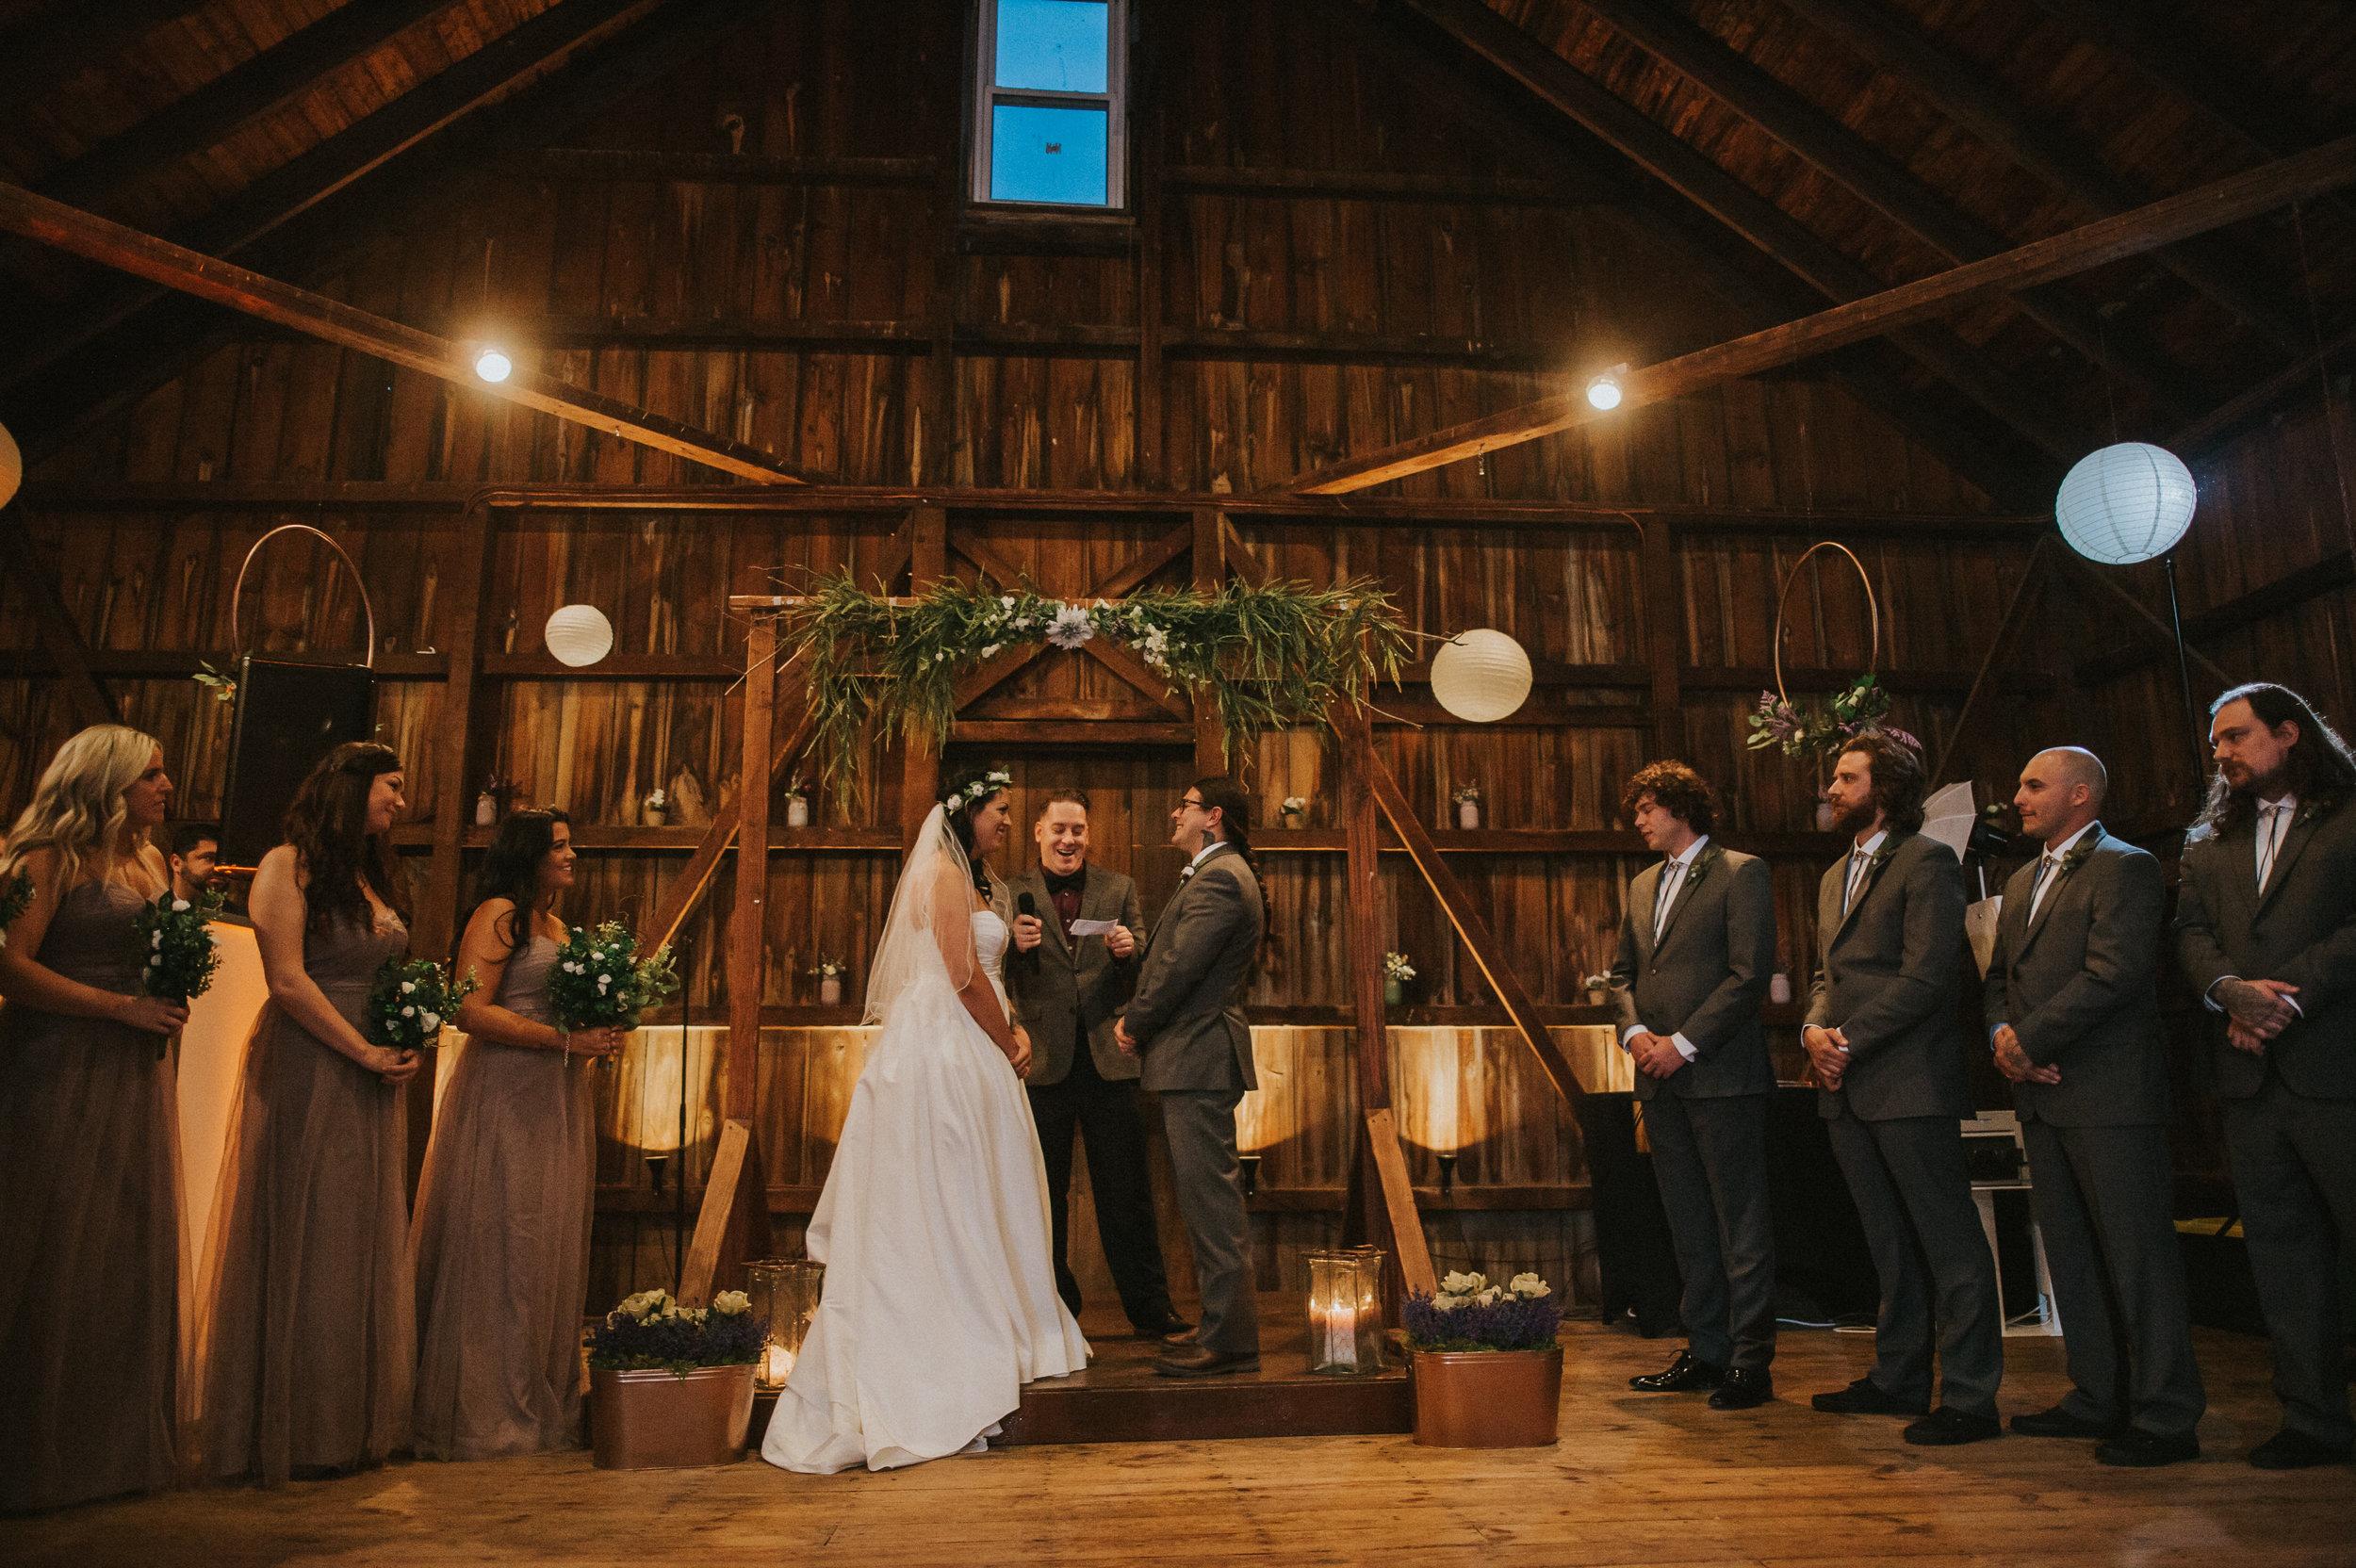 Rodes-Barn-Wedding-Mackenzie-and-Dylan-374.jpg